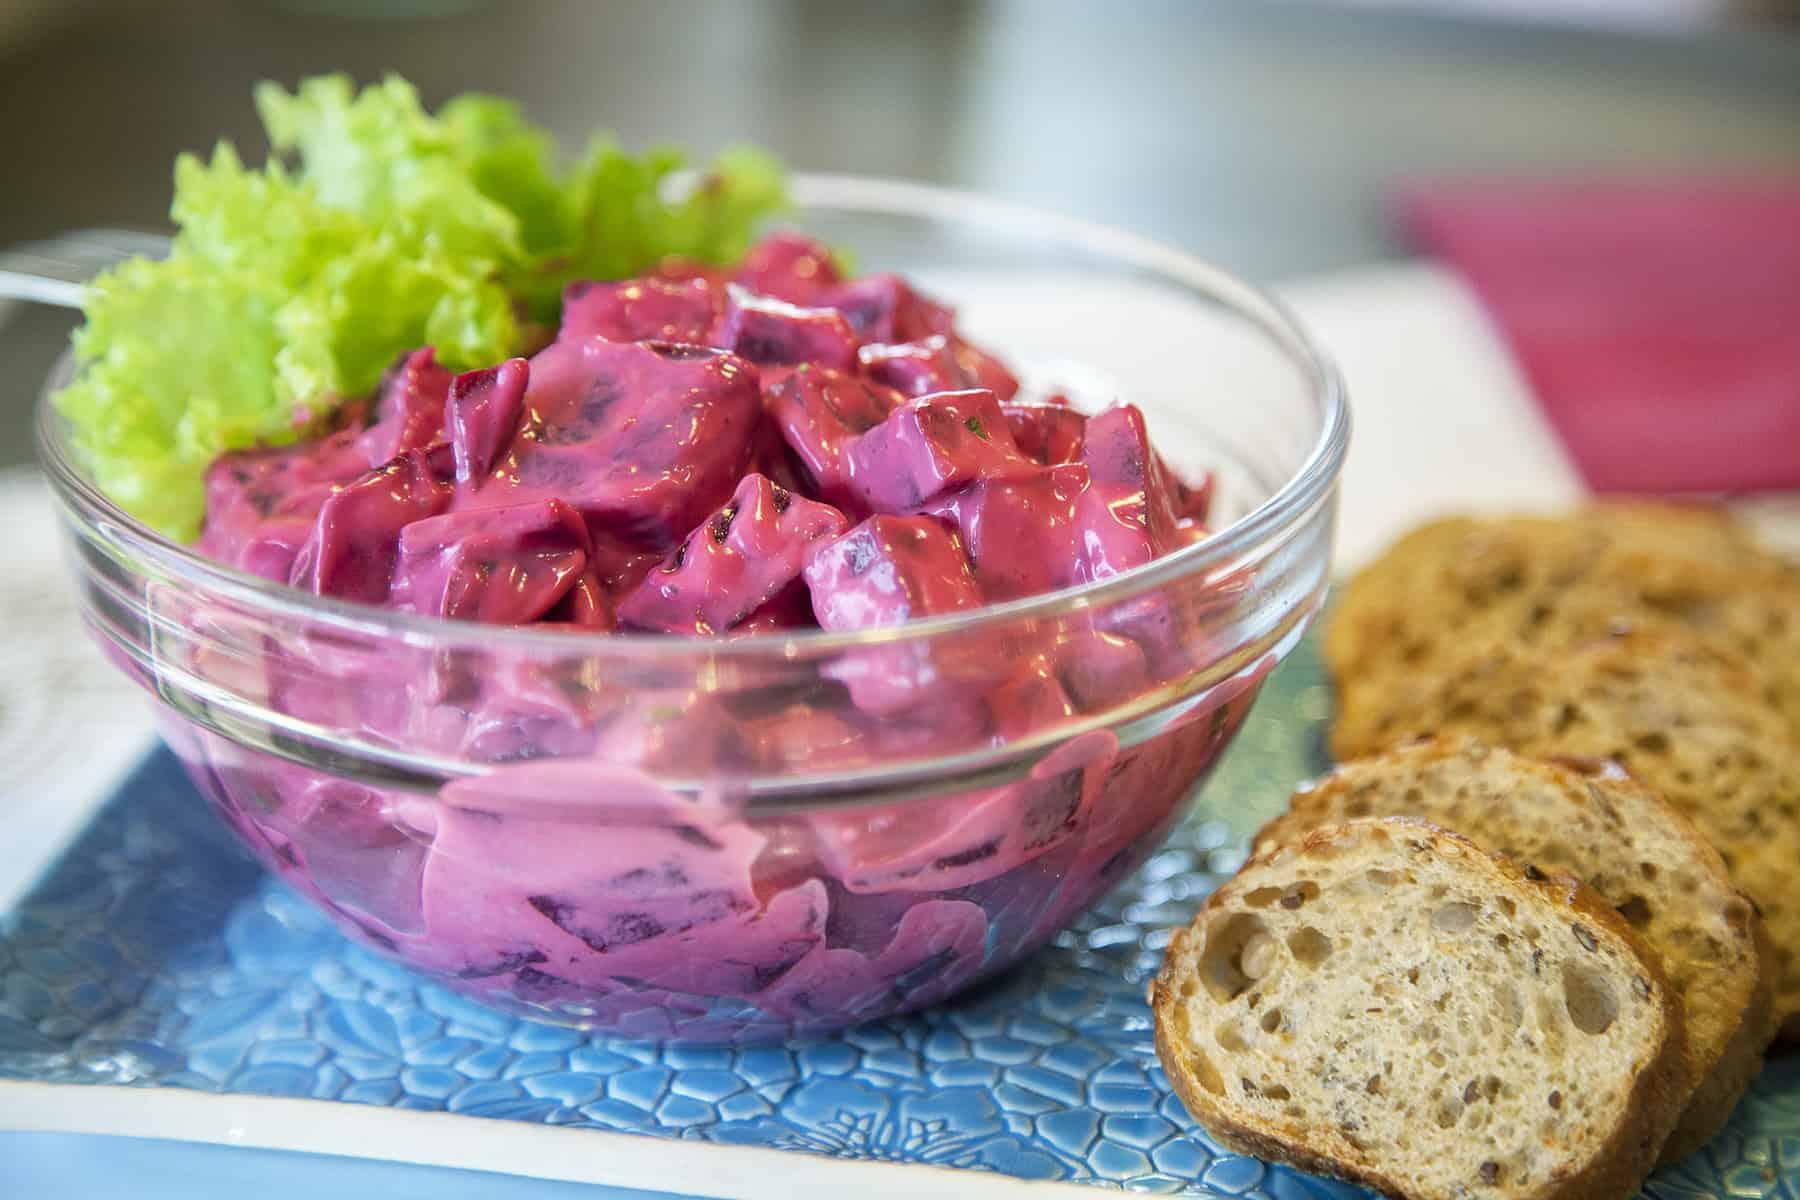 vegan-majonezes-cekla-salata-napfenyes-cukraszat